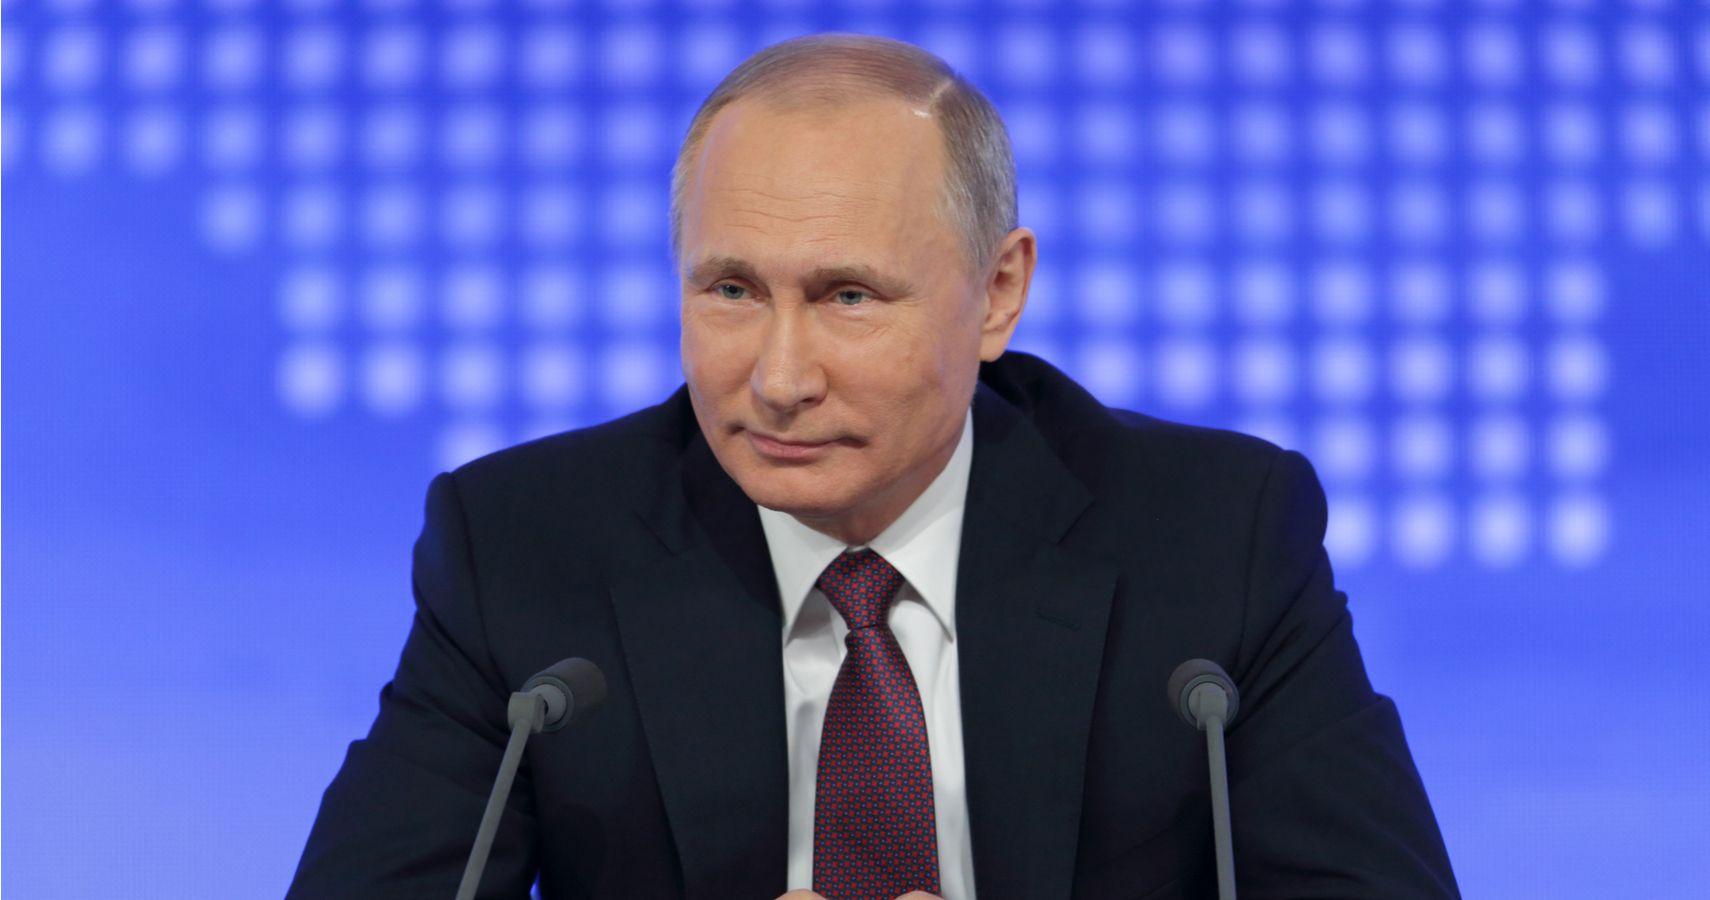 A Peek Inside Vladimir Putin's $125 Million Dollar Yacht Collection